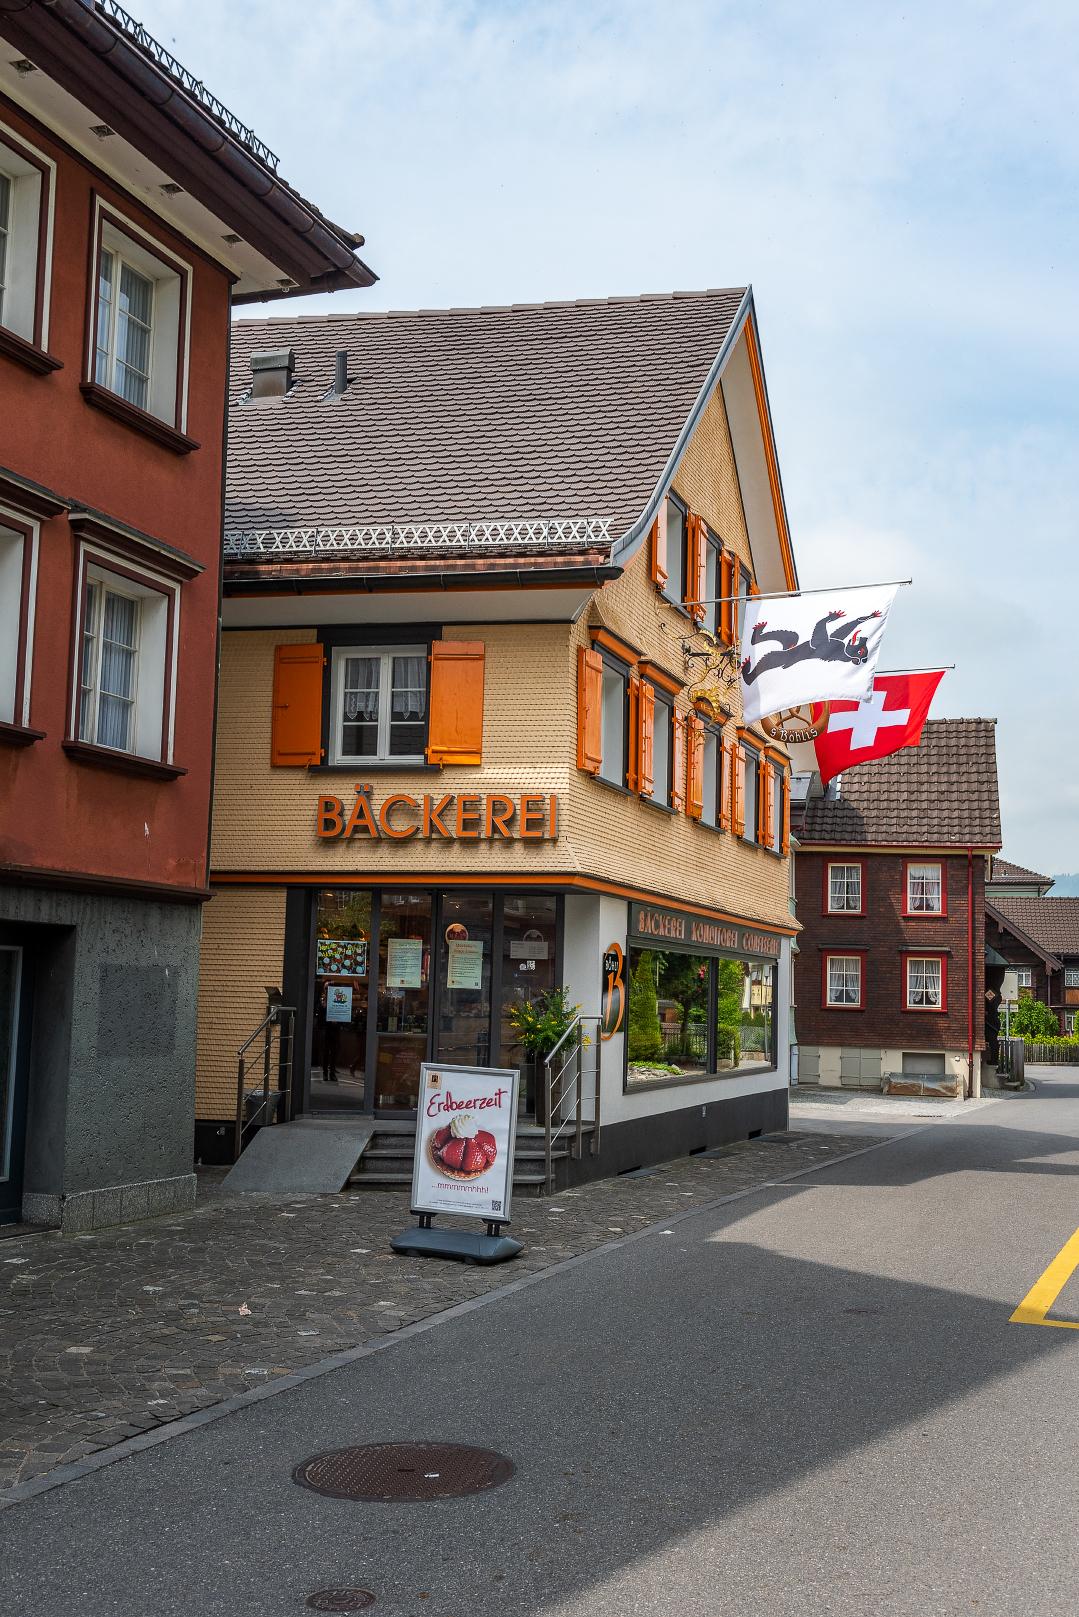 A bakery in Appenzell, Switzerland